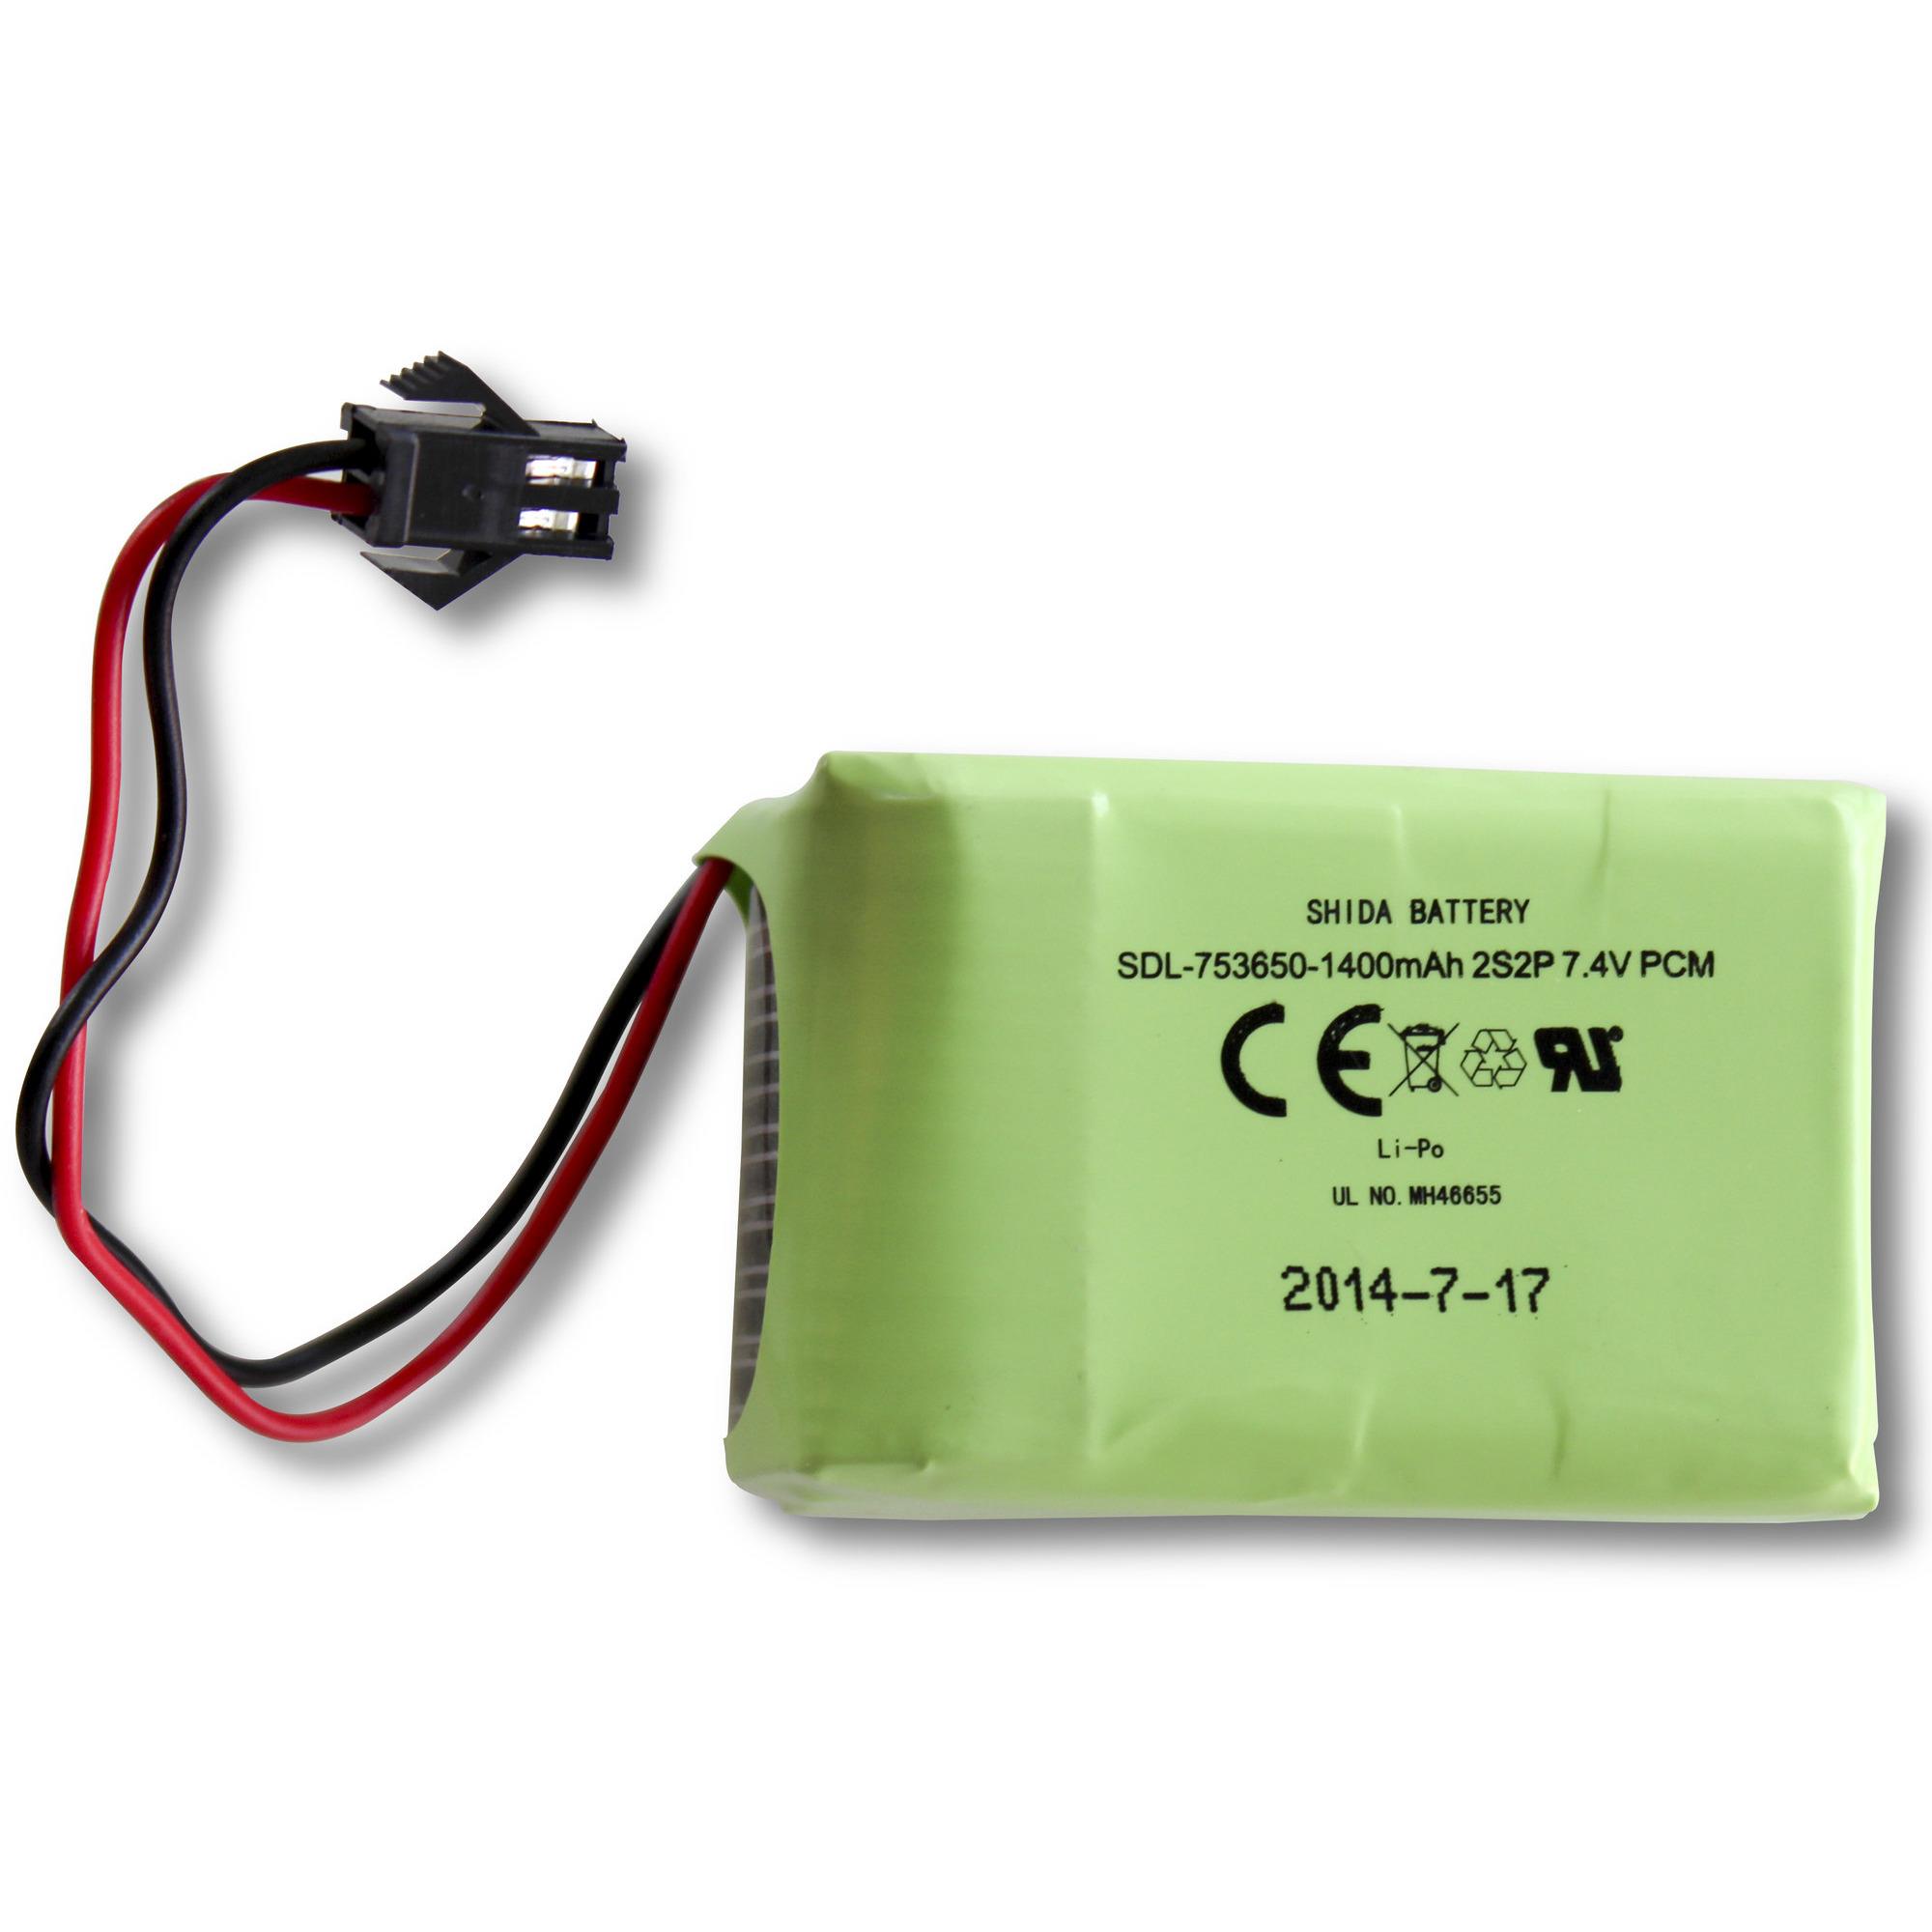 Grillbot EU-batteri